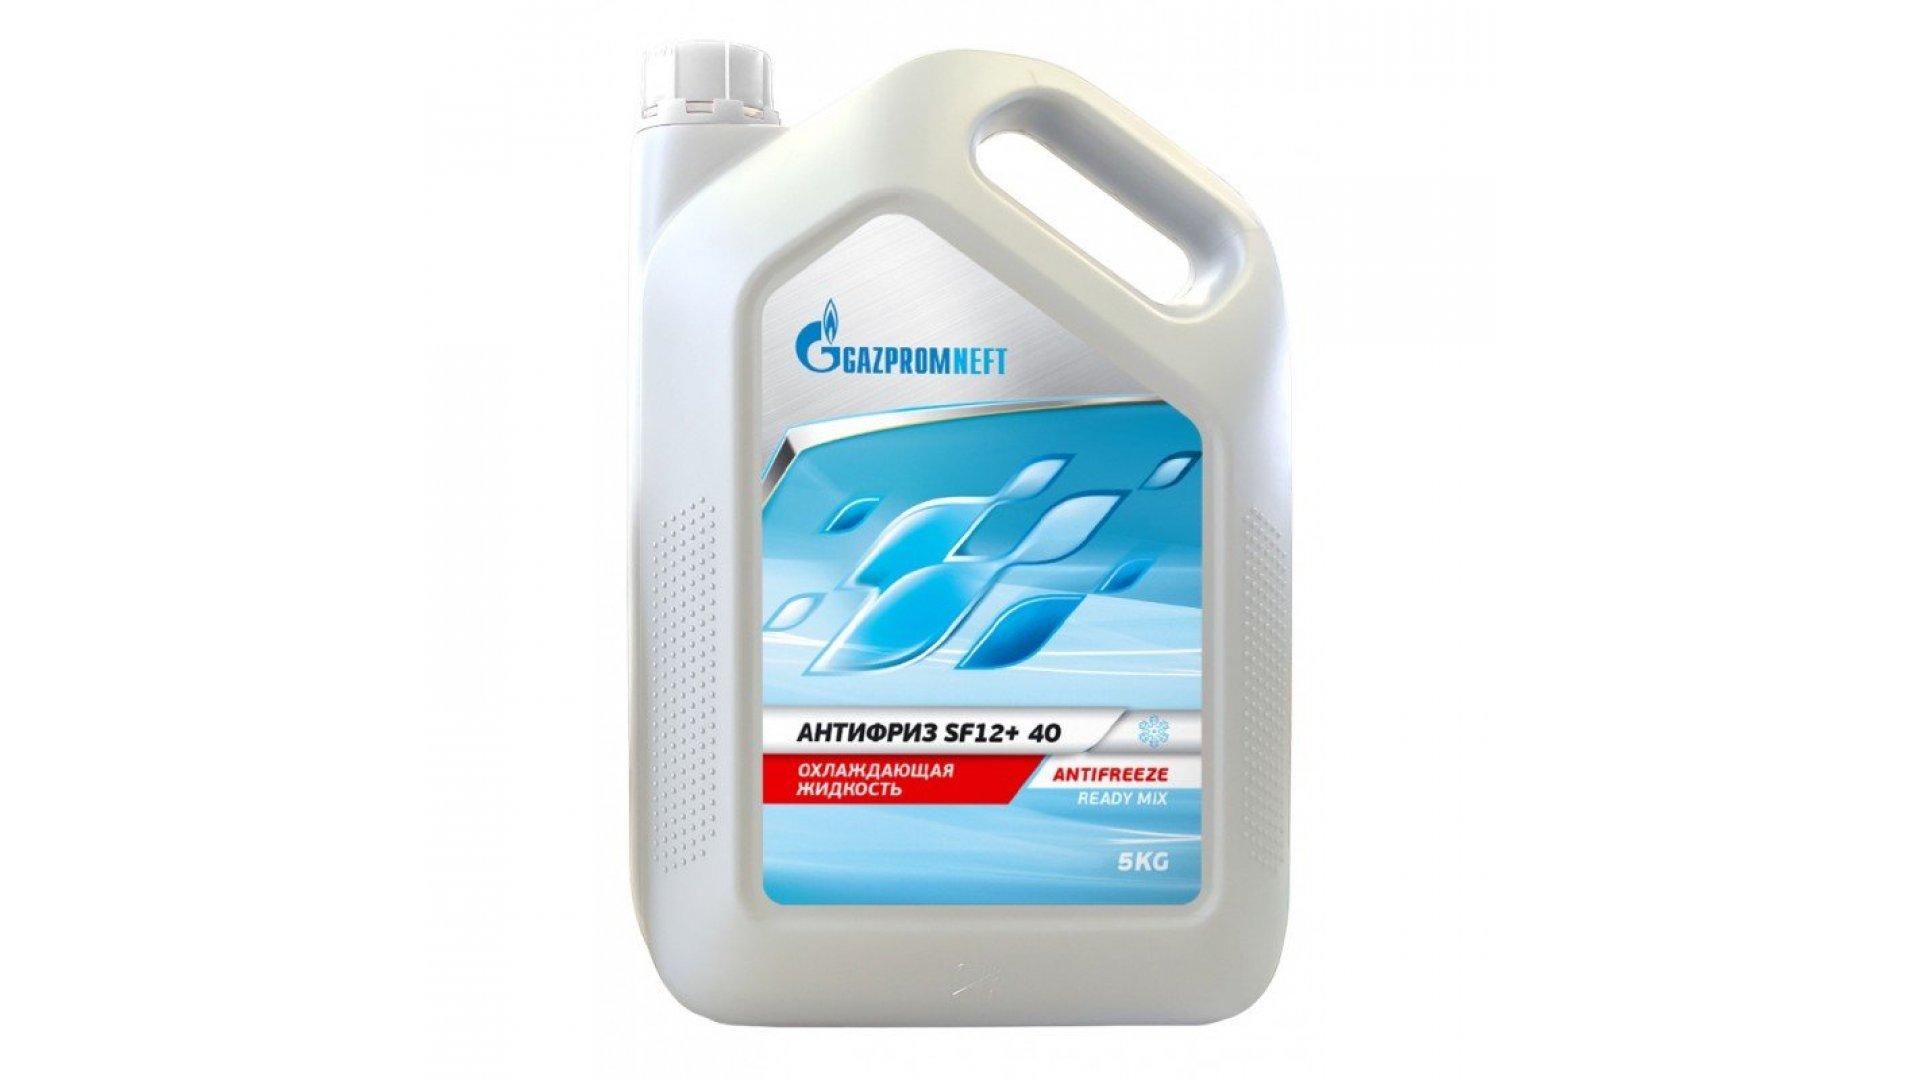 GAZPROM Antifreeze 40 5L